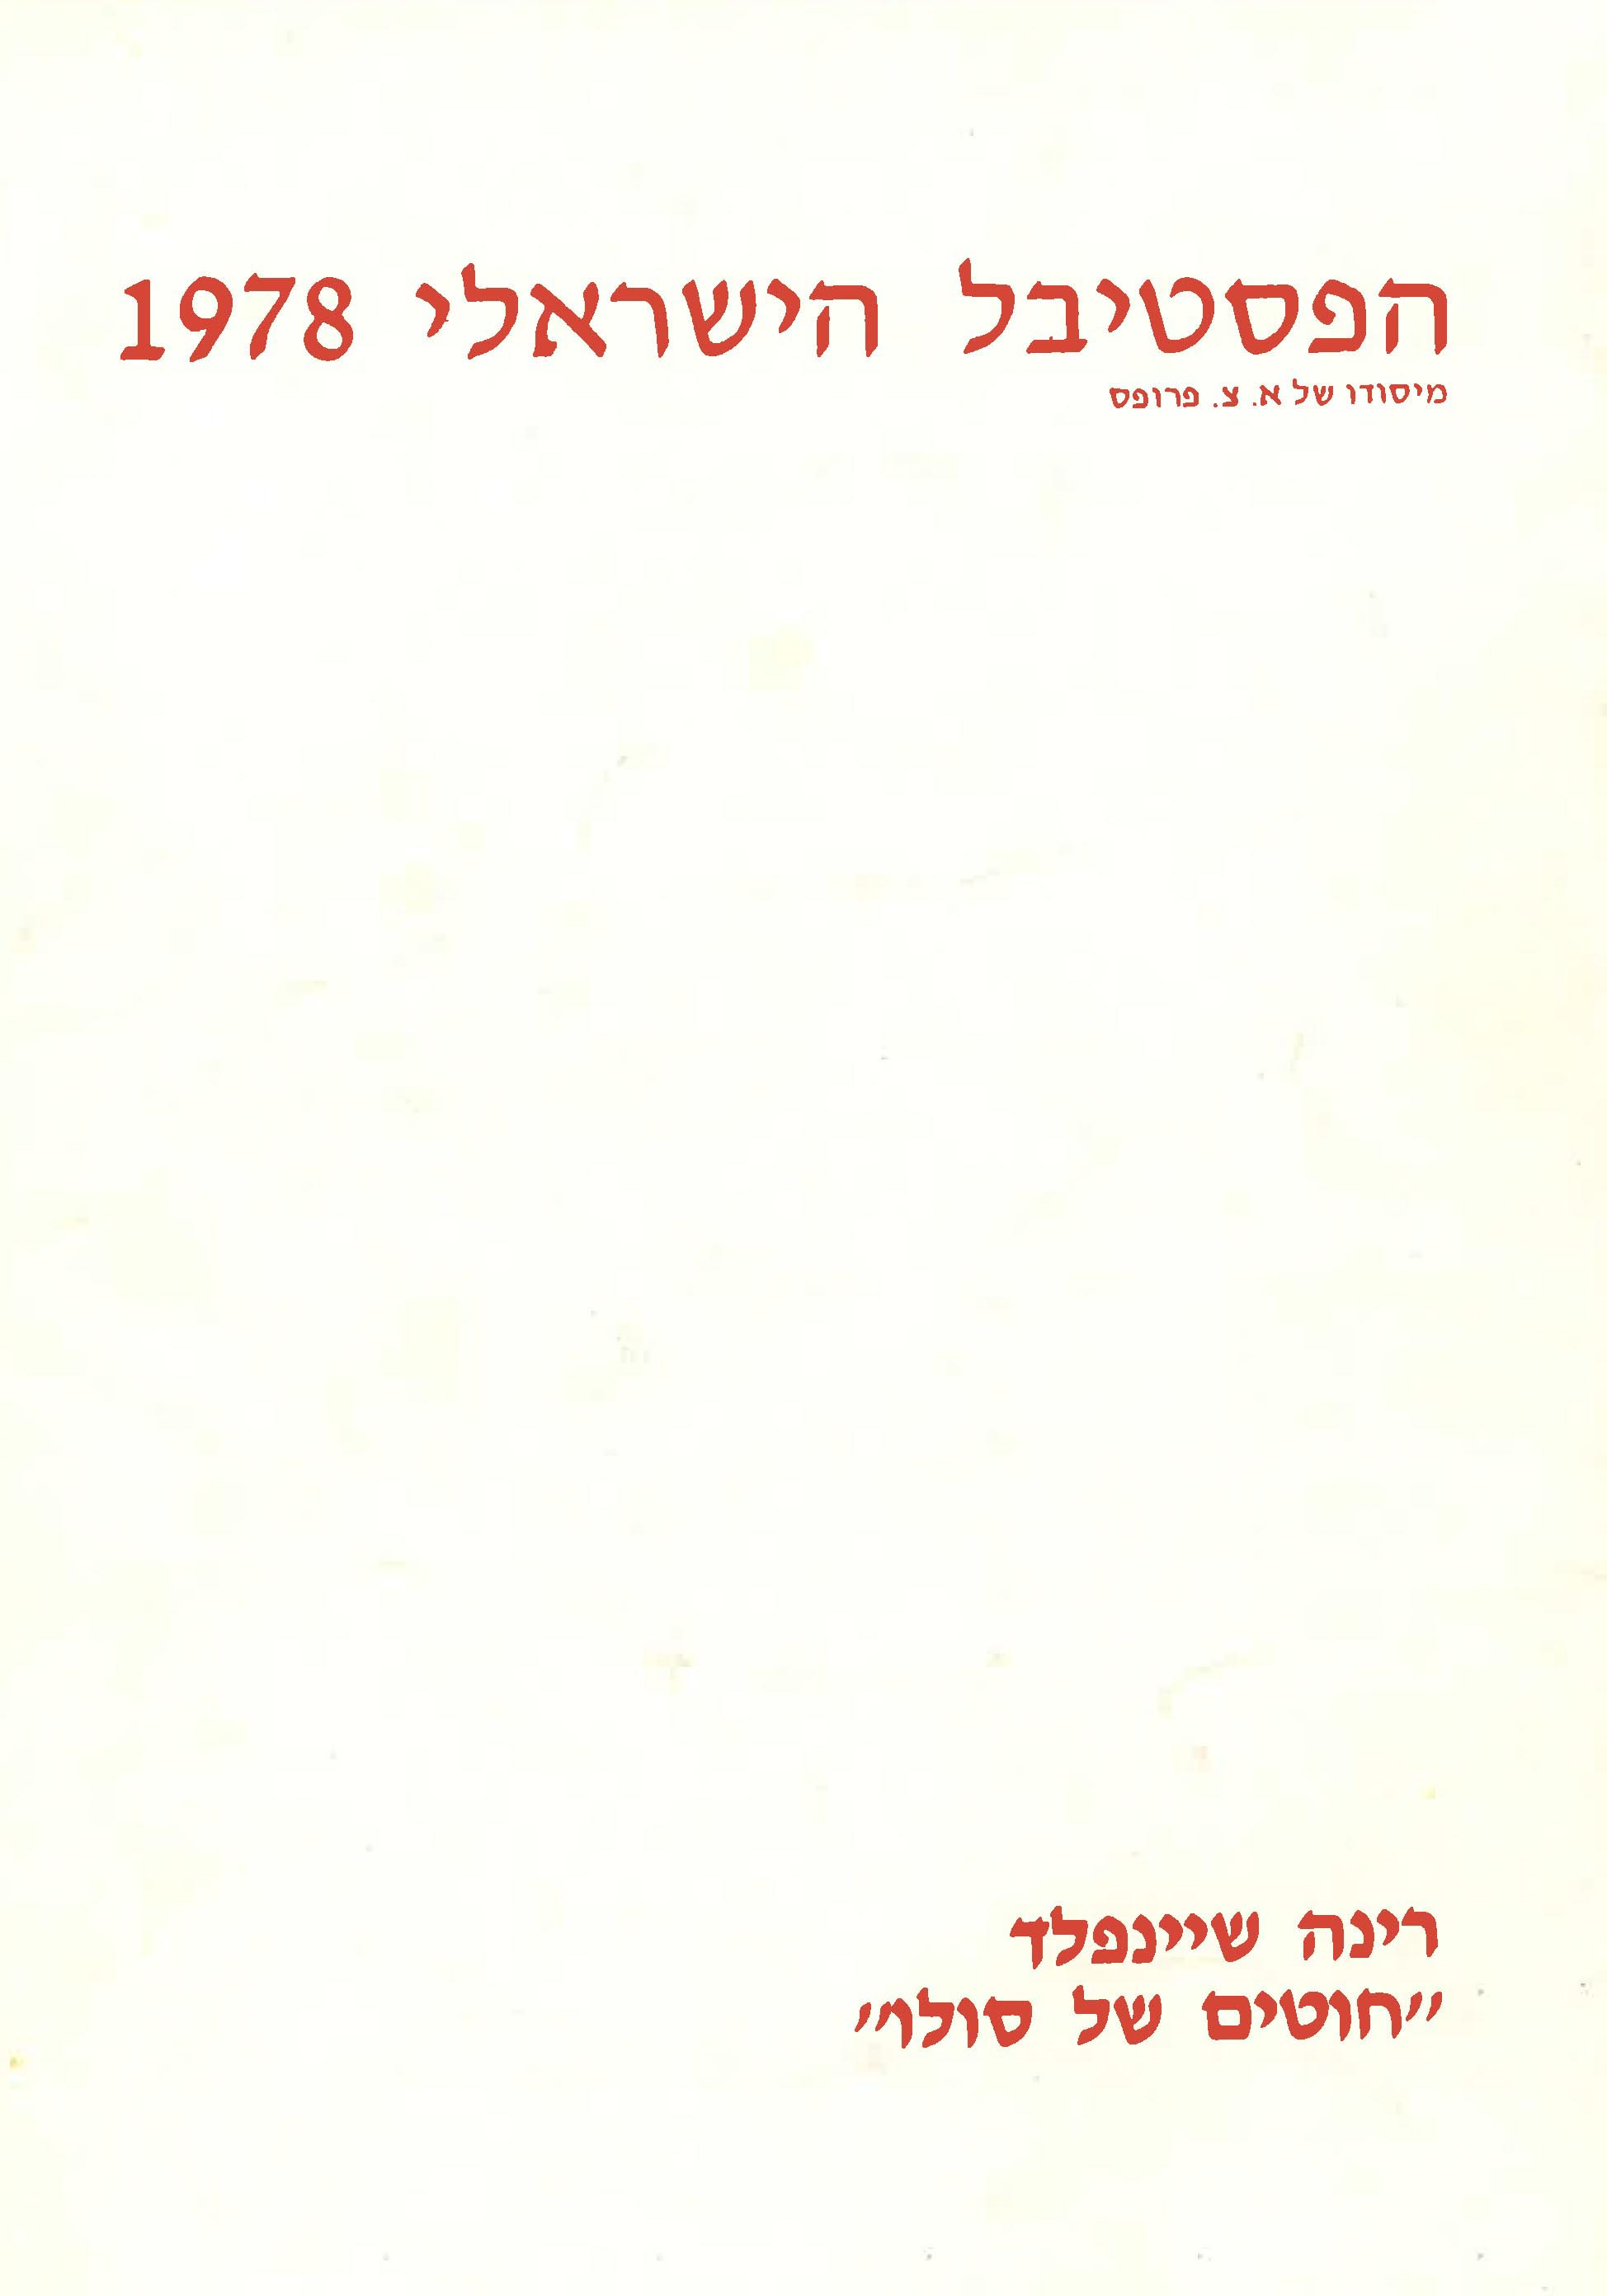 PROGRAMME THE FESTIVAL OF ISRAEL HEBREW COVER  .jpg